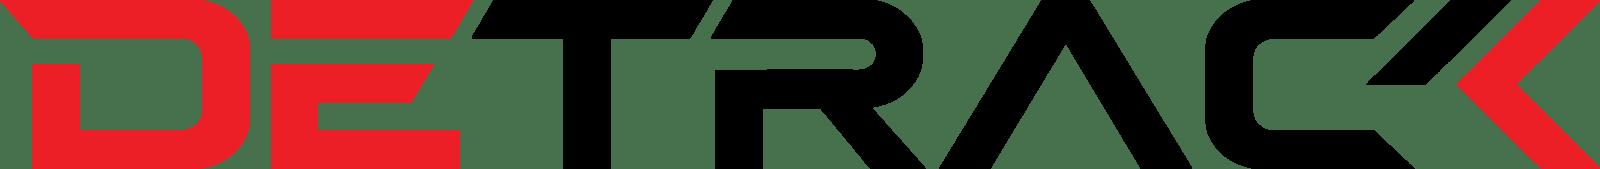 Detrack logo